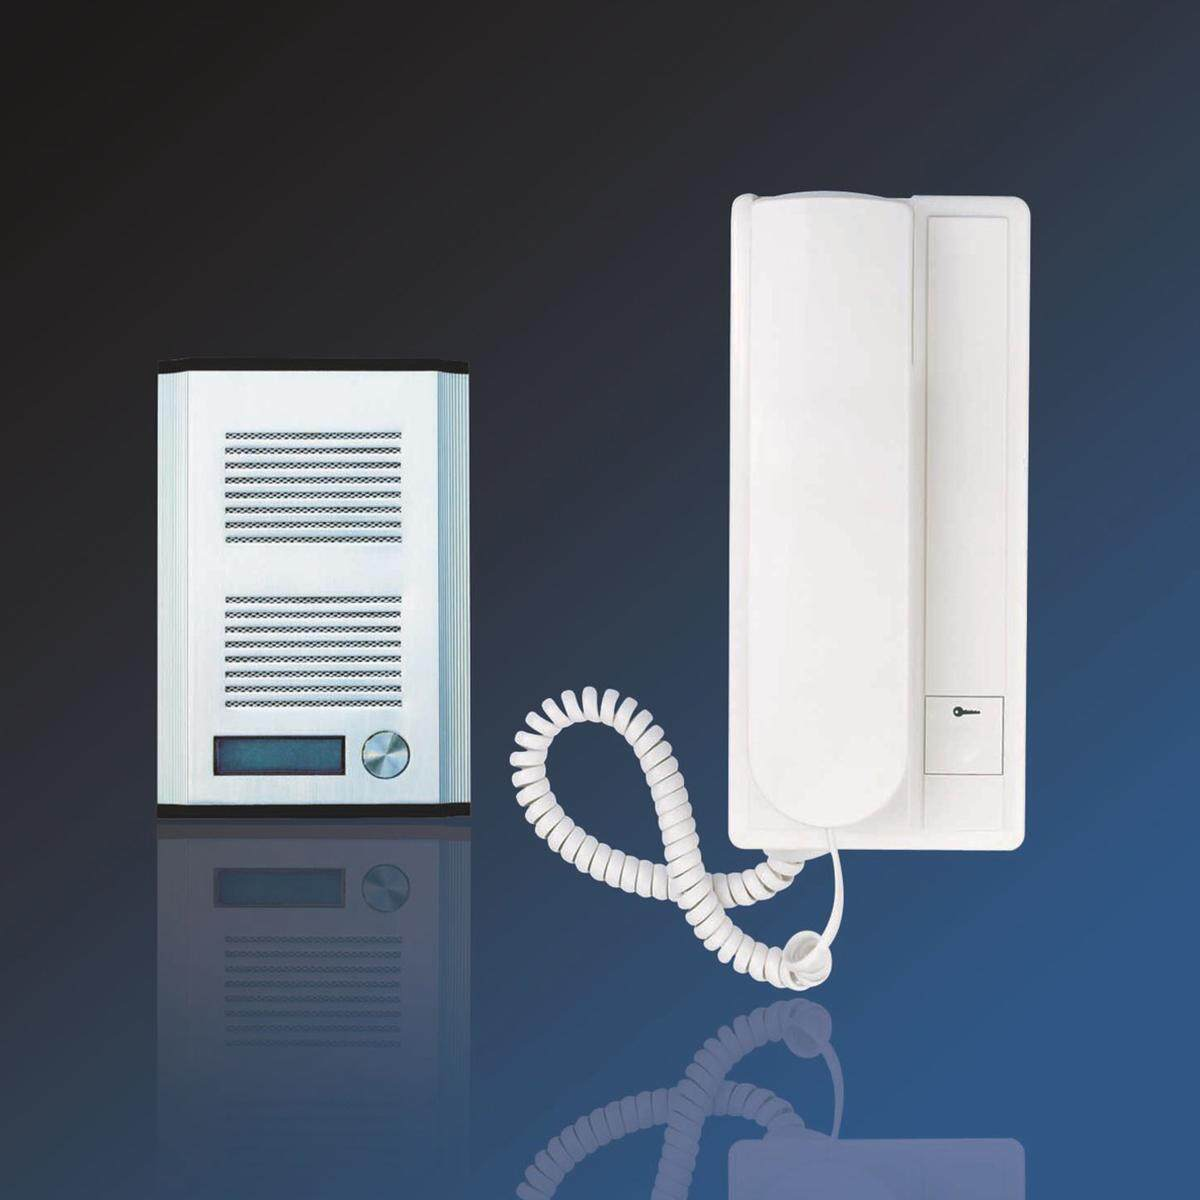 BELL SYSTEM AUDIO DOOR PHONE INTERCOM with ELECTRIC LOCK KIT POWER